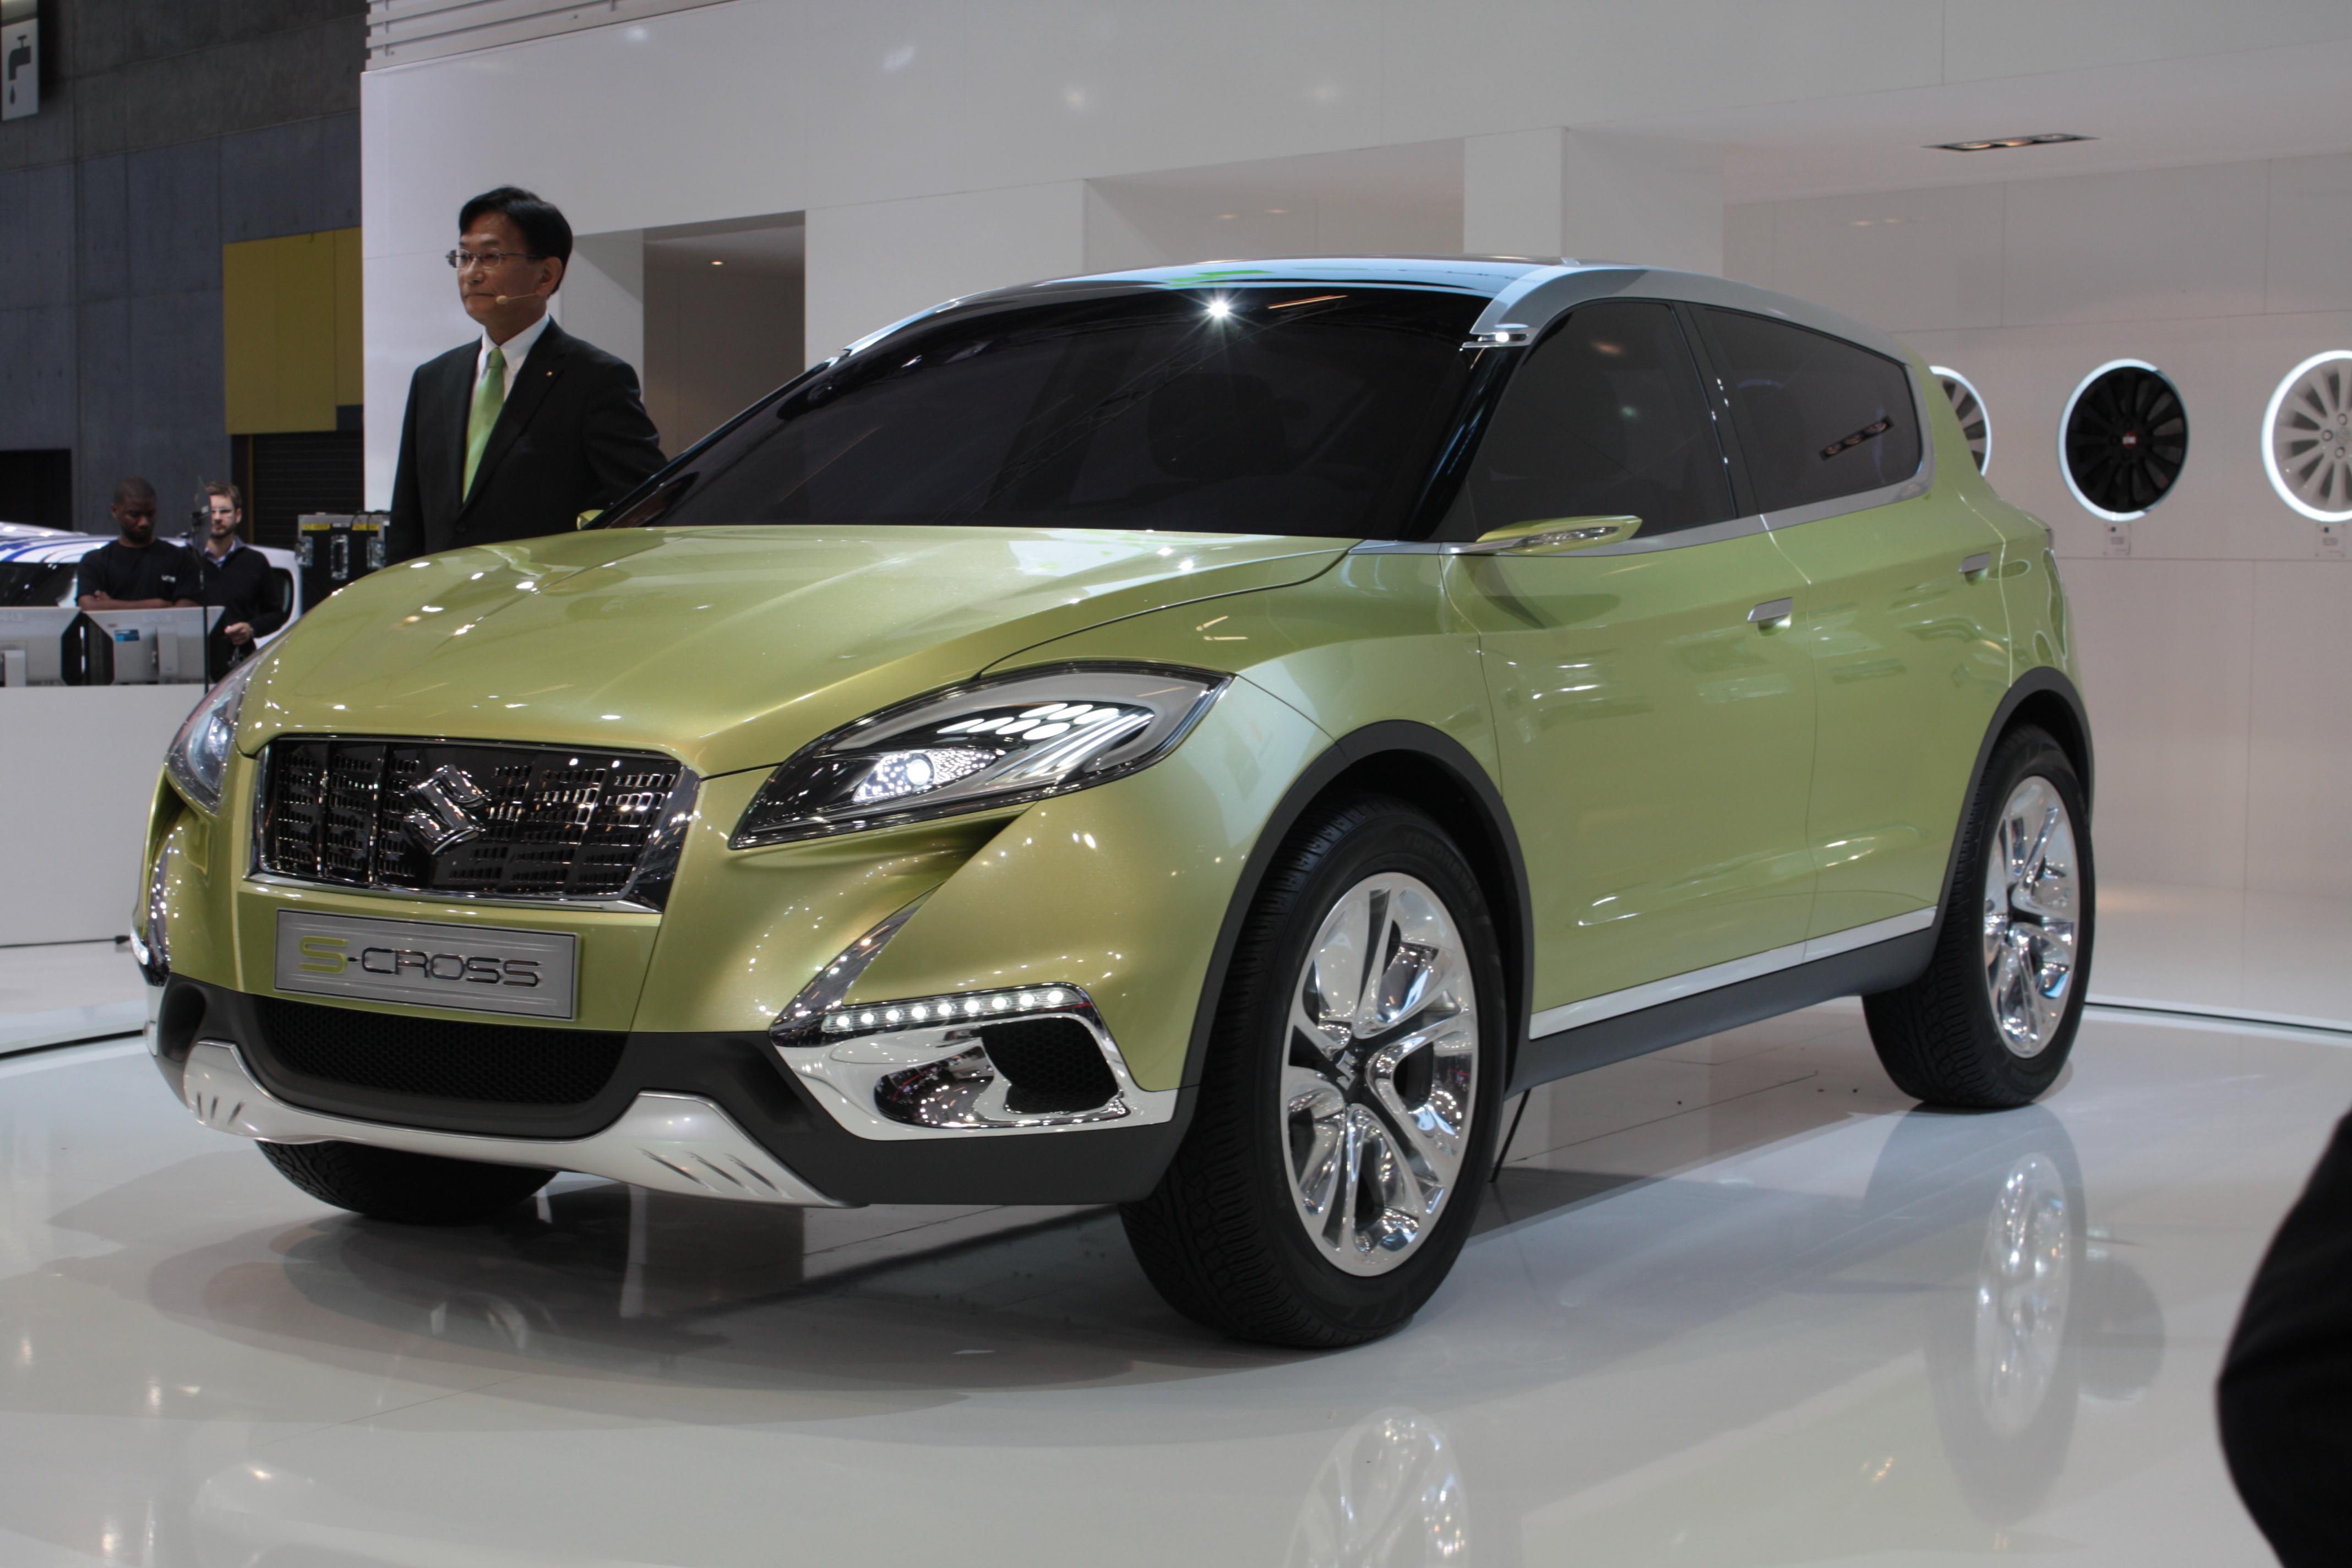 http://images.caradisiac.com/images/1/4/0/6/81406/S0-En-direct-du-Mondial-2012-Suzuki-S-Cross-Concept-273156.jpg